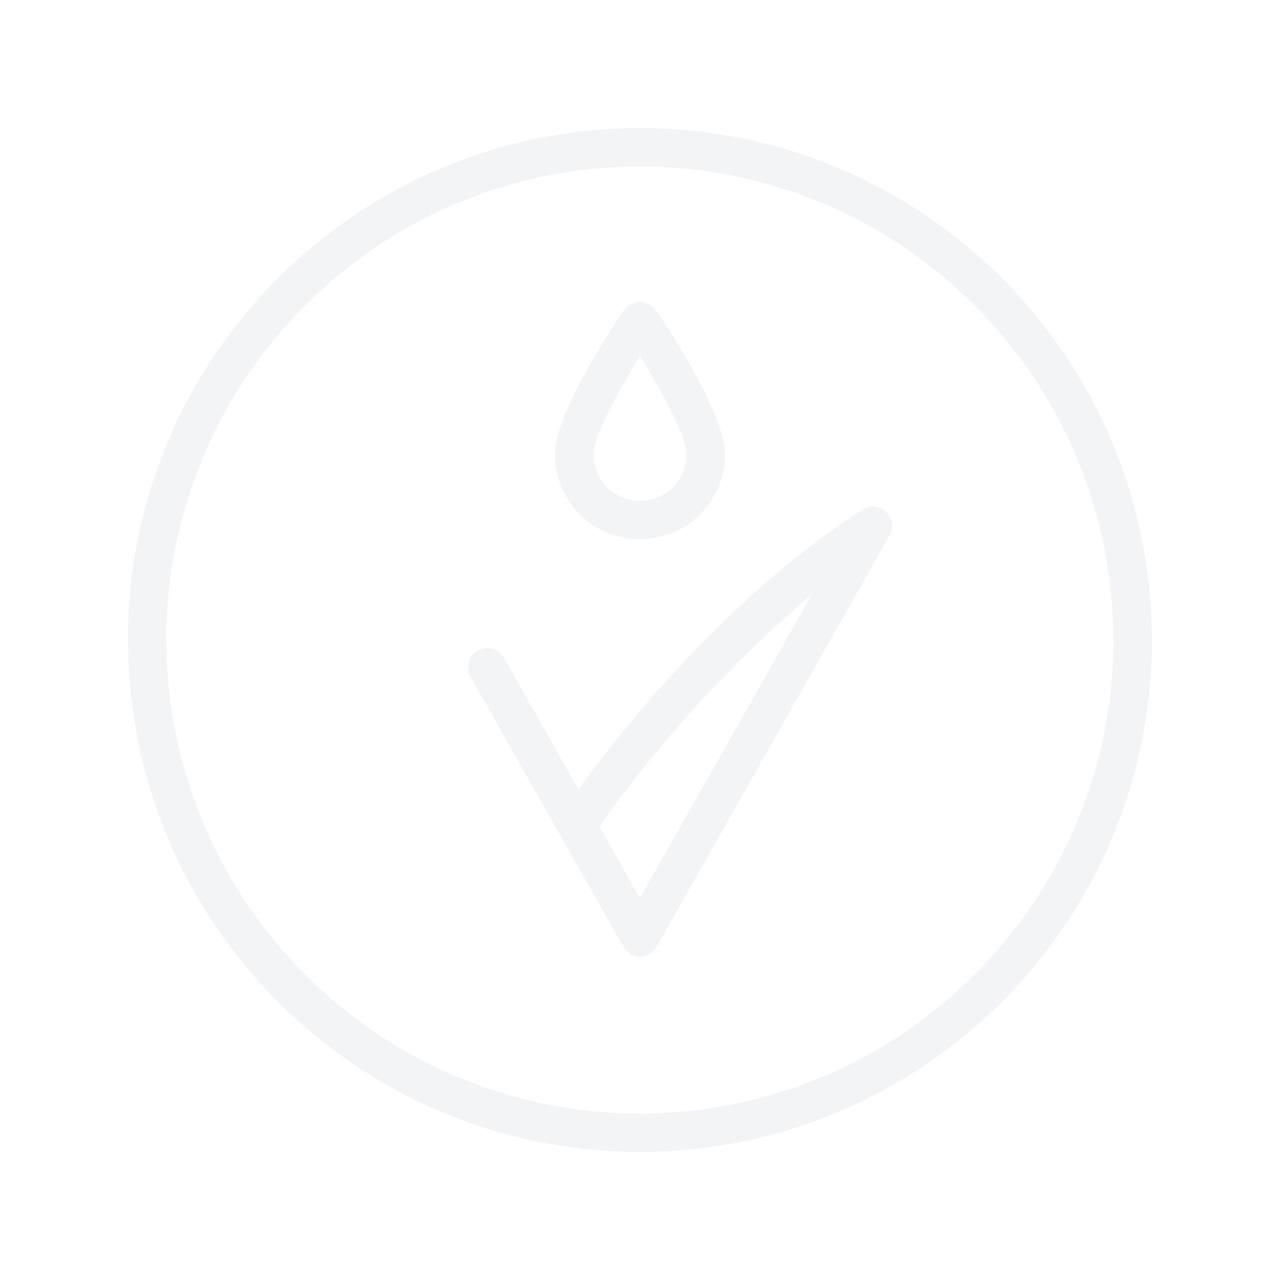 Sleek Makeup Twist Up Lip Pencil No.995 Nude 0.3g